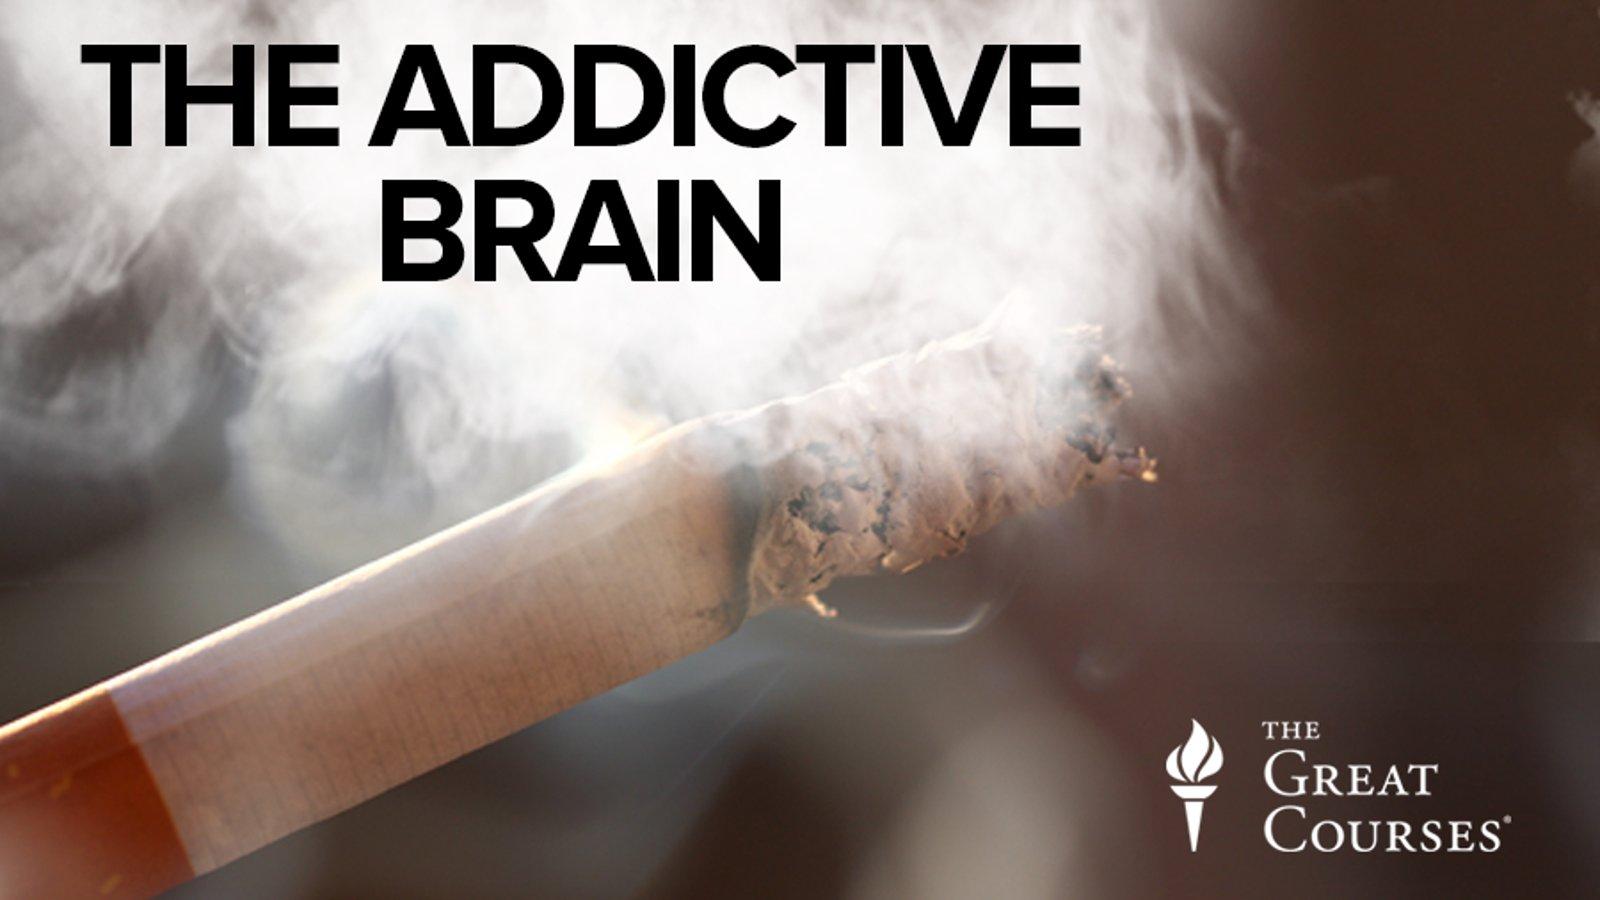 The Addictive Brain